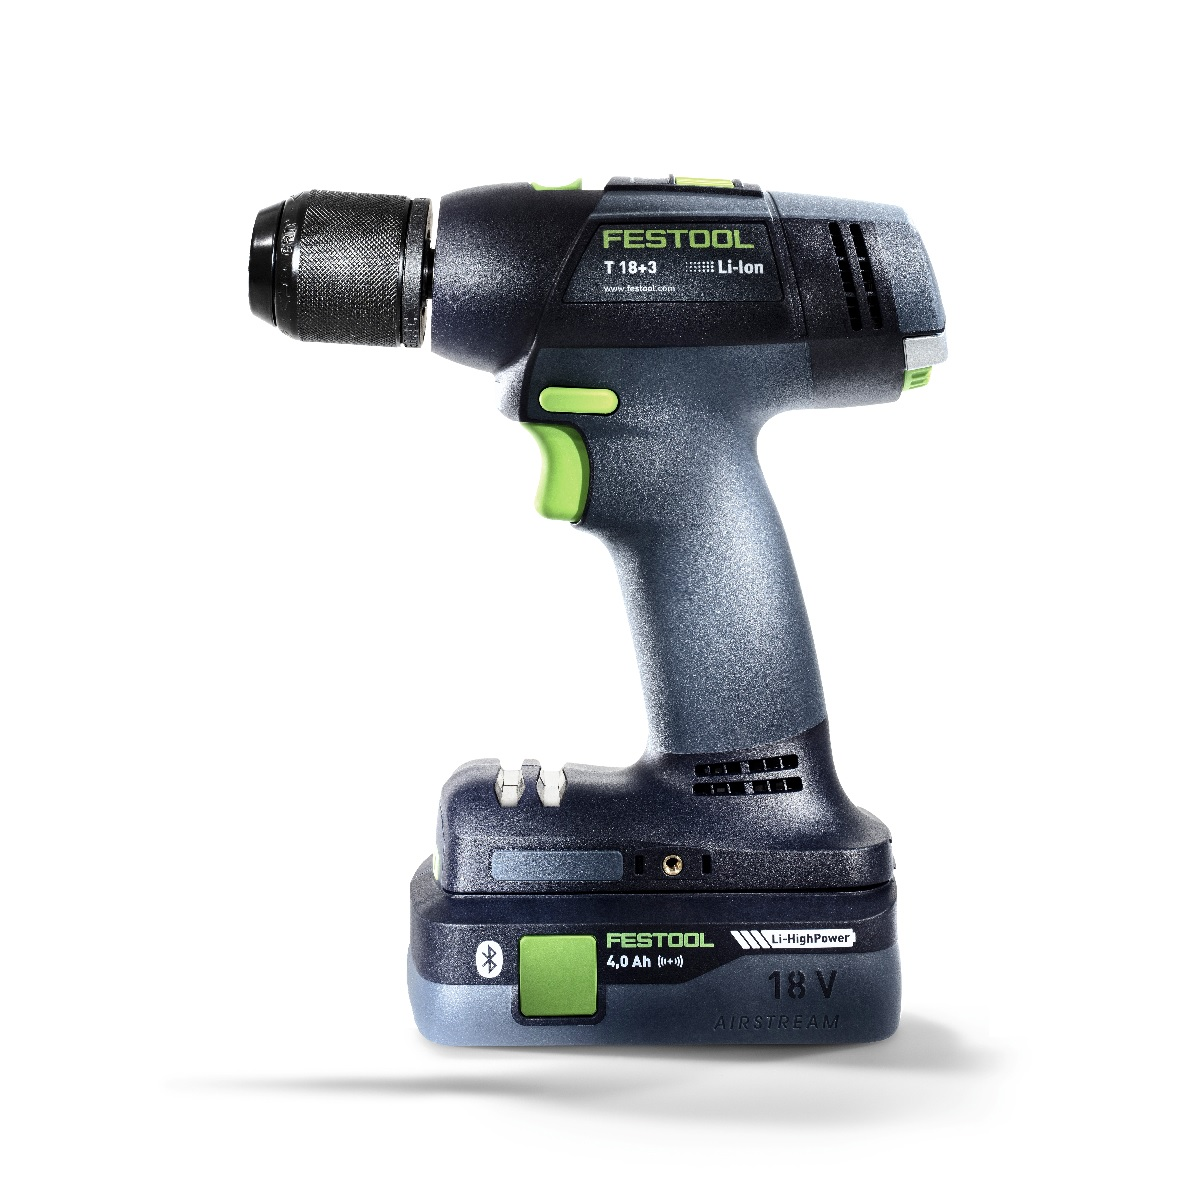 Festool T18+3-E 18V Cordless Drill